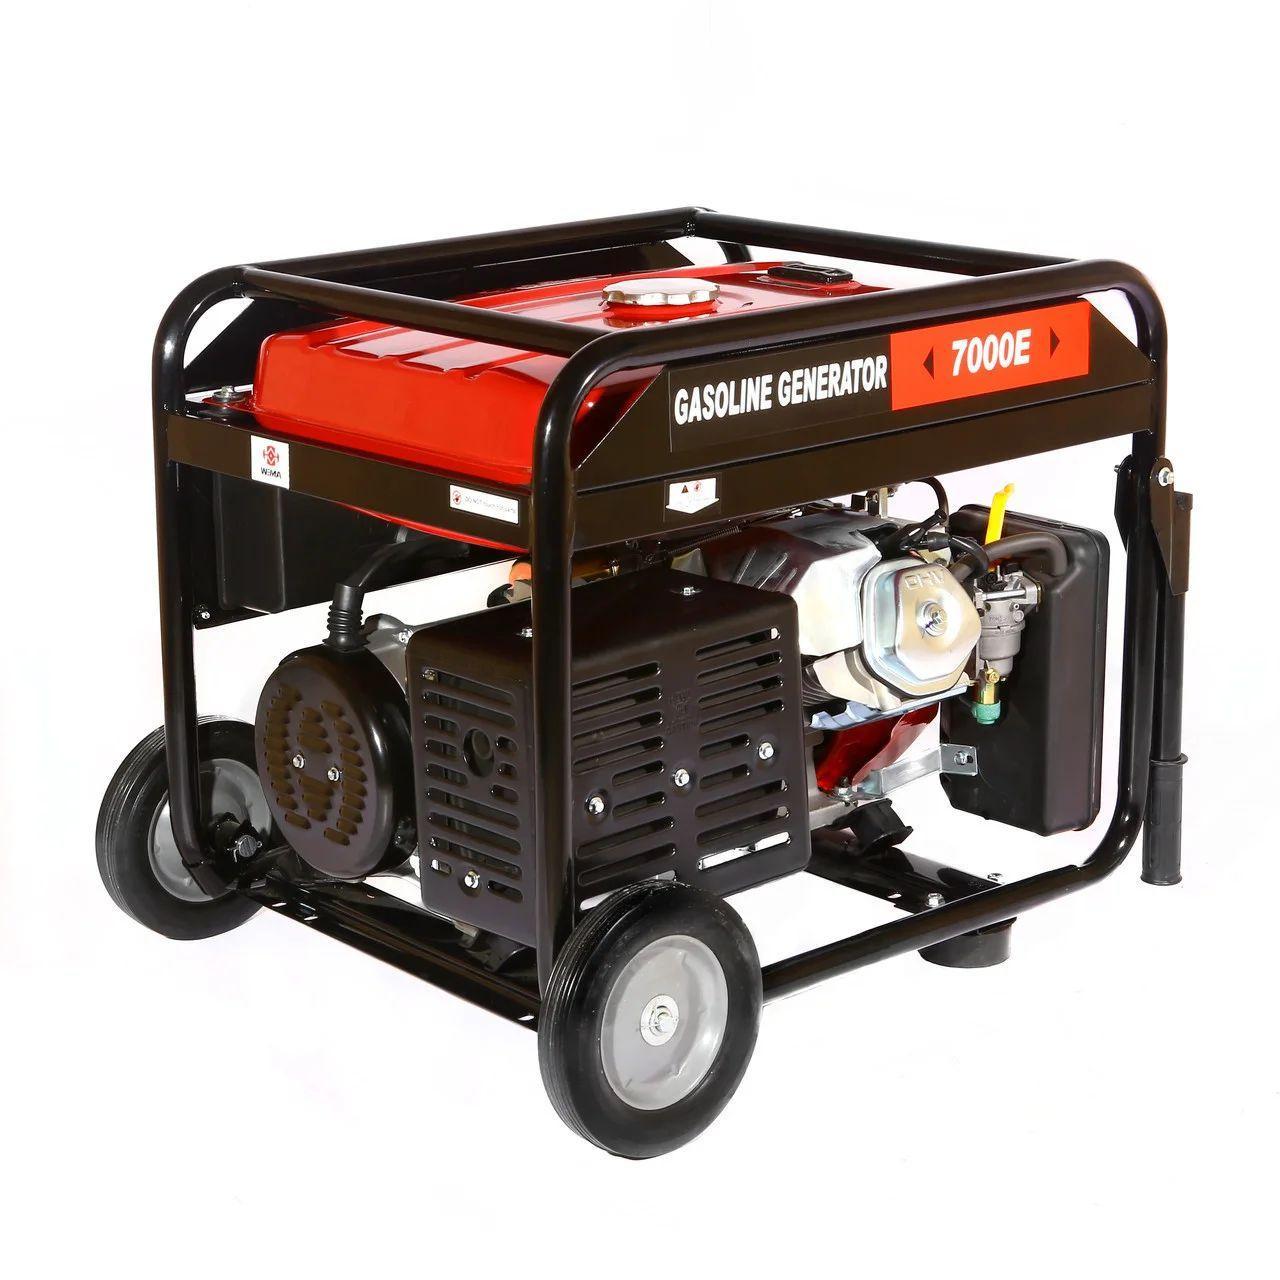 Генератор бензиновий WEIMA WM7000E (7 КВТ, 1 ФАЗА, ЕЛЕКТРОСТАРТЕР) Безкоштовна доставка !!!